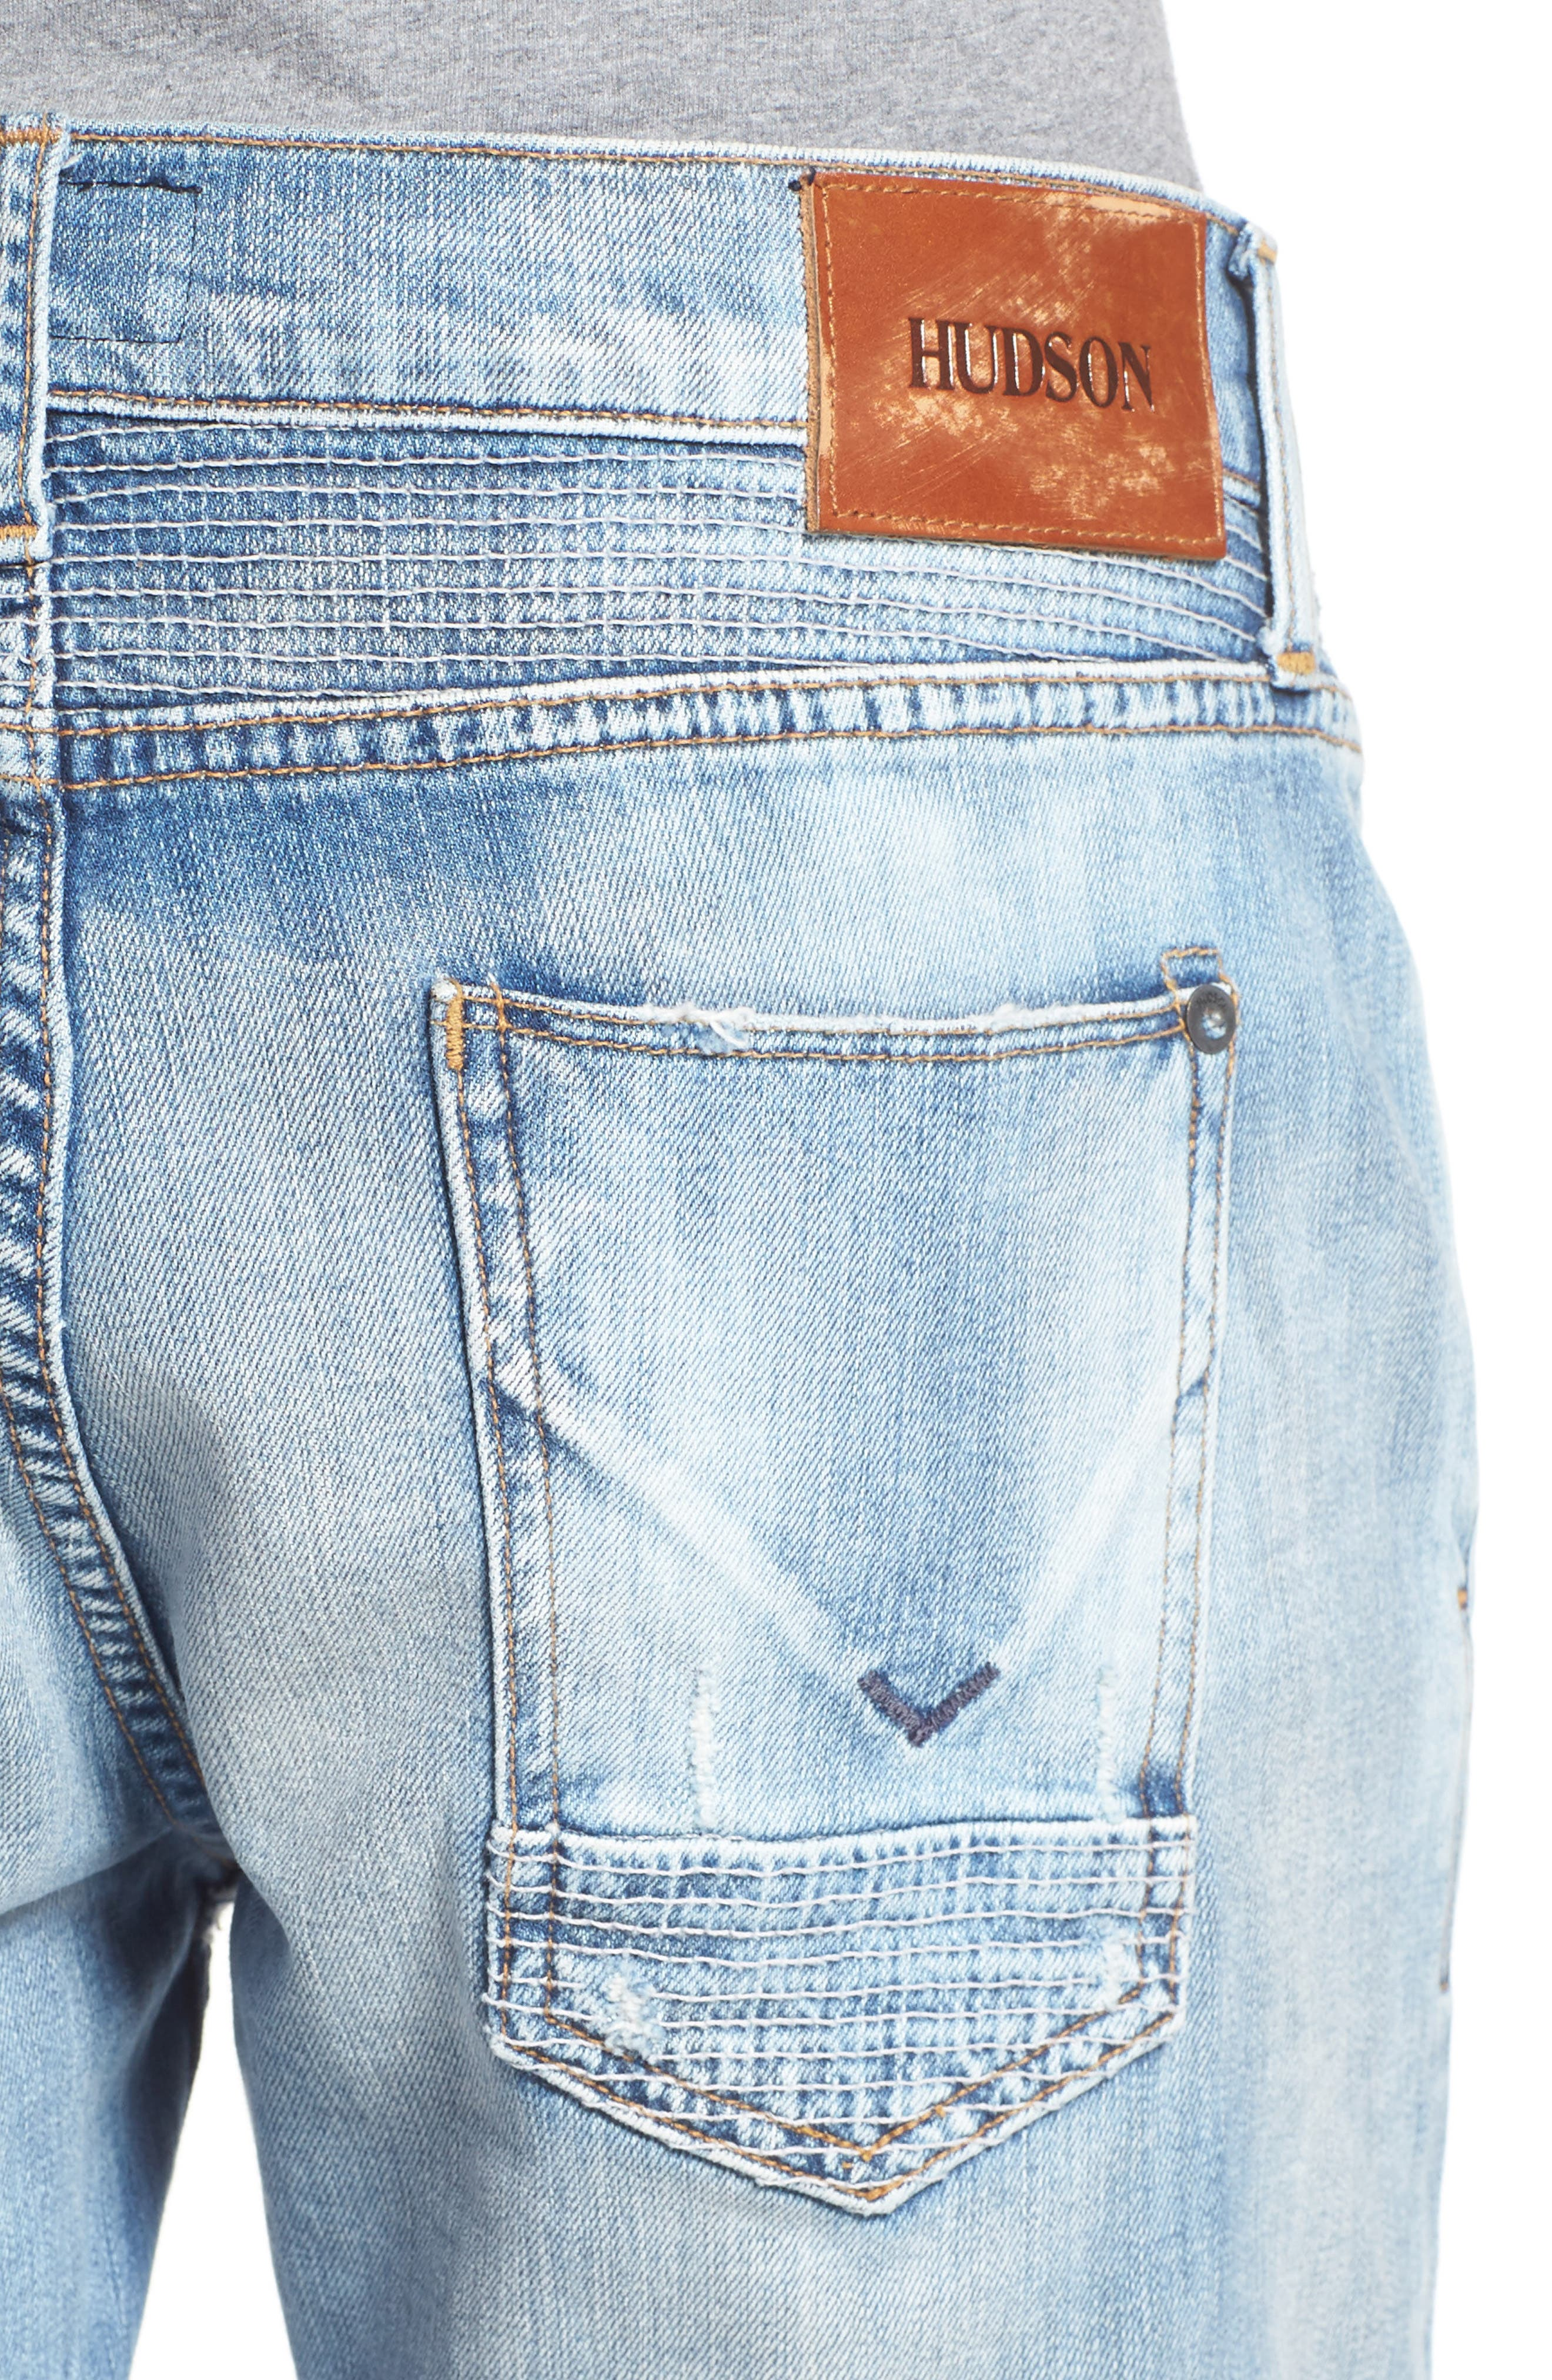 Blinder Skinny Fit Moto Jeans,                             Alternate thumbnail 4, color,                             429